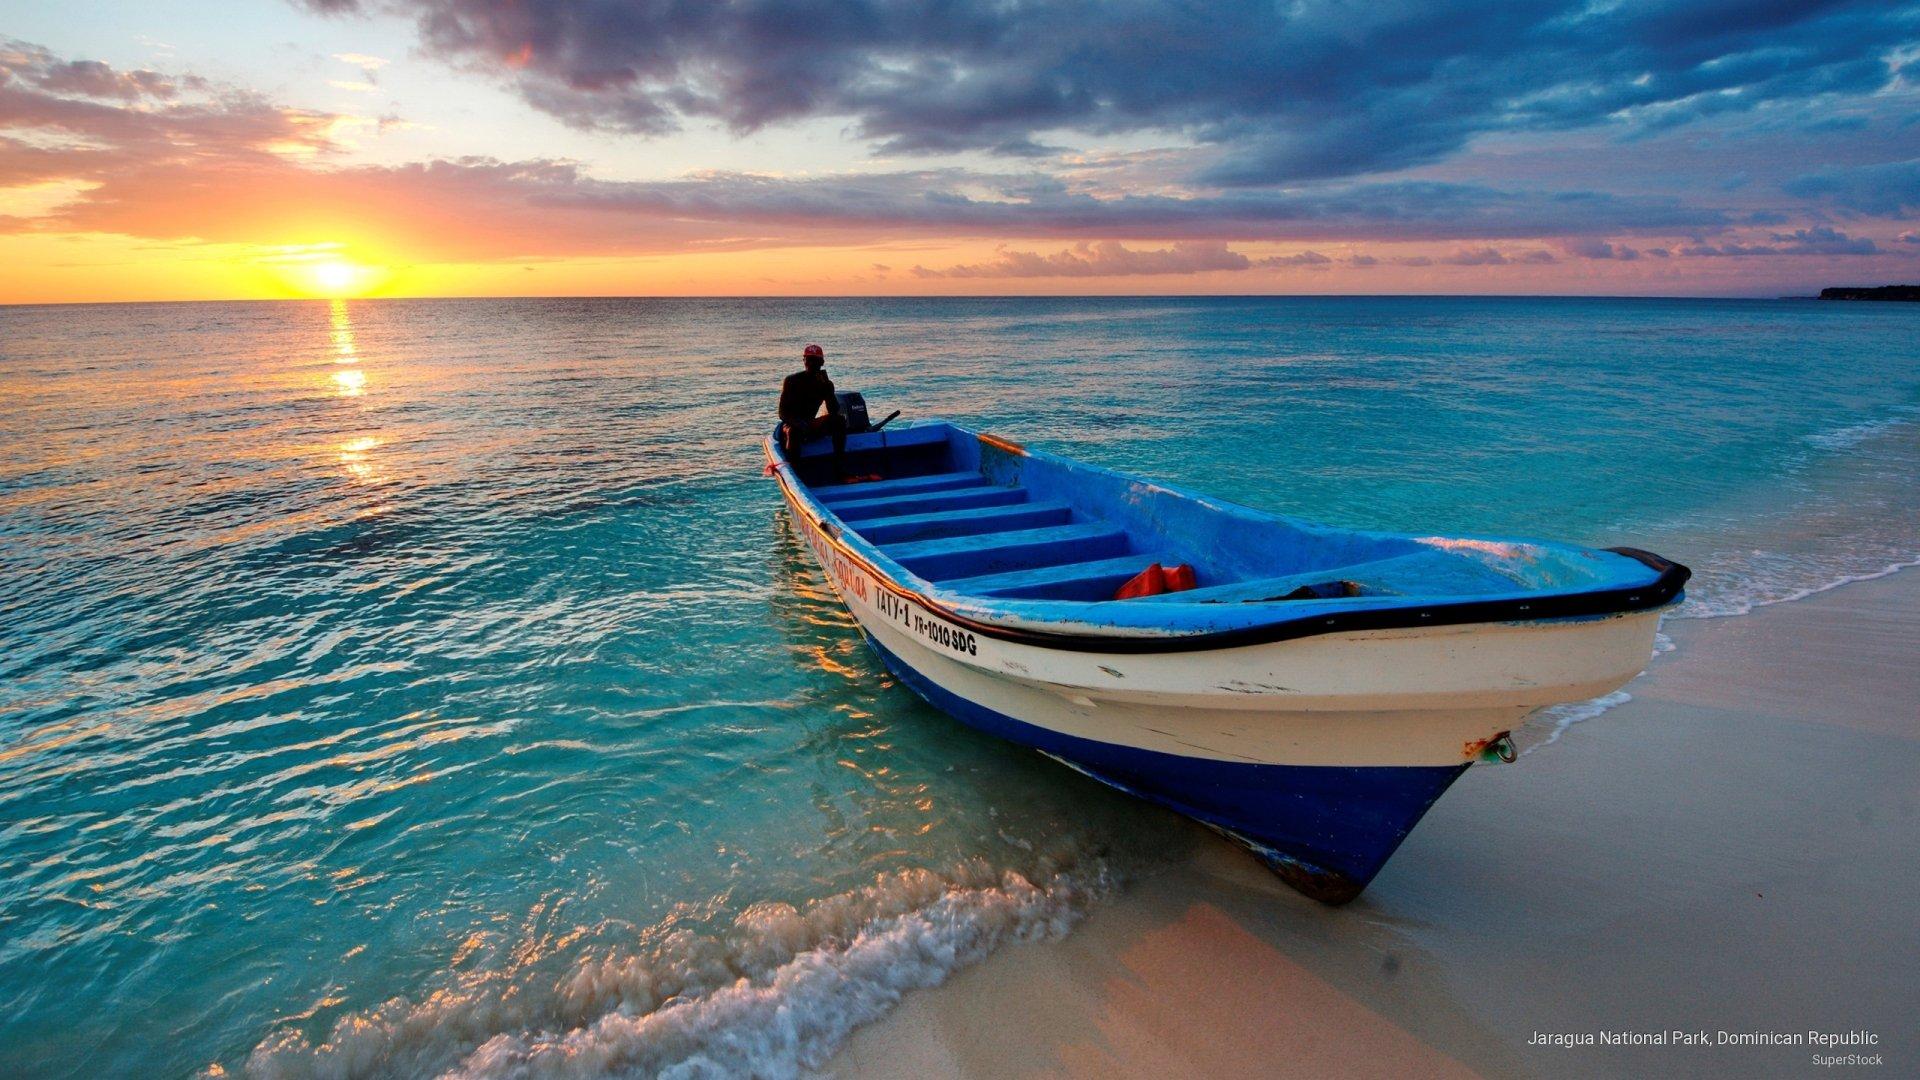 3840x2400 wallpaper ocean boat - photo #42